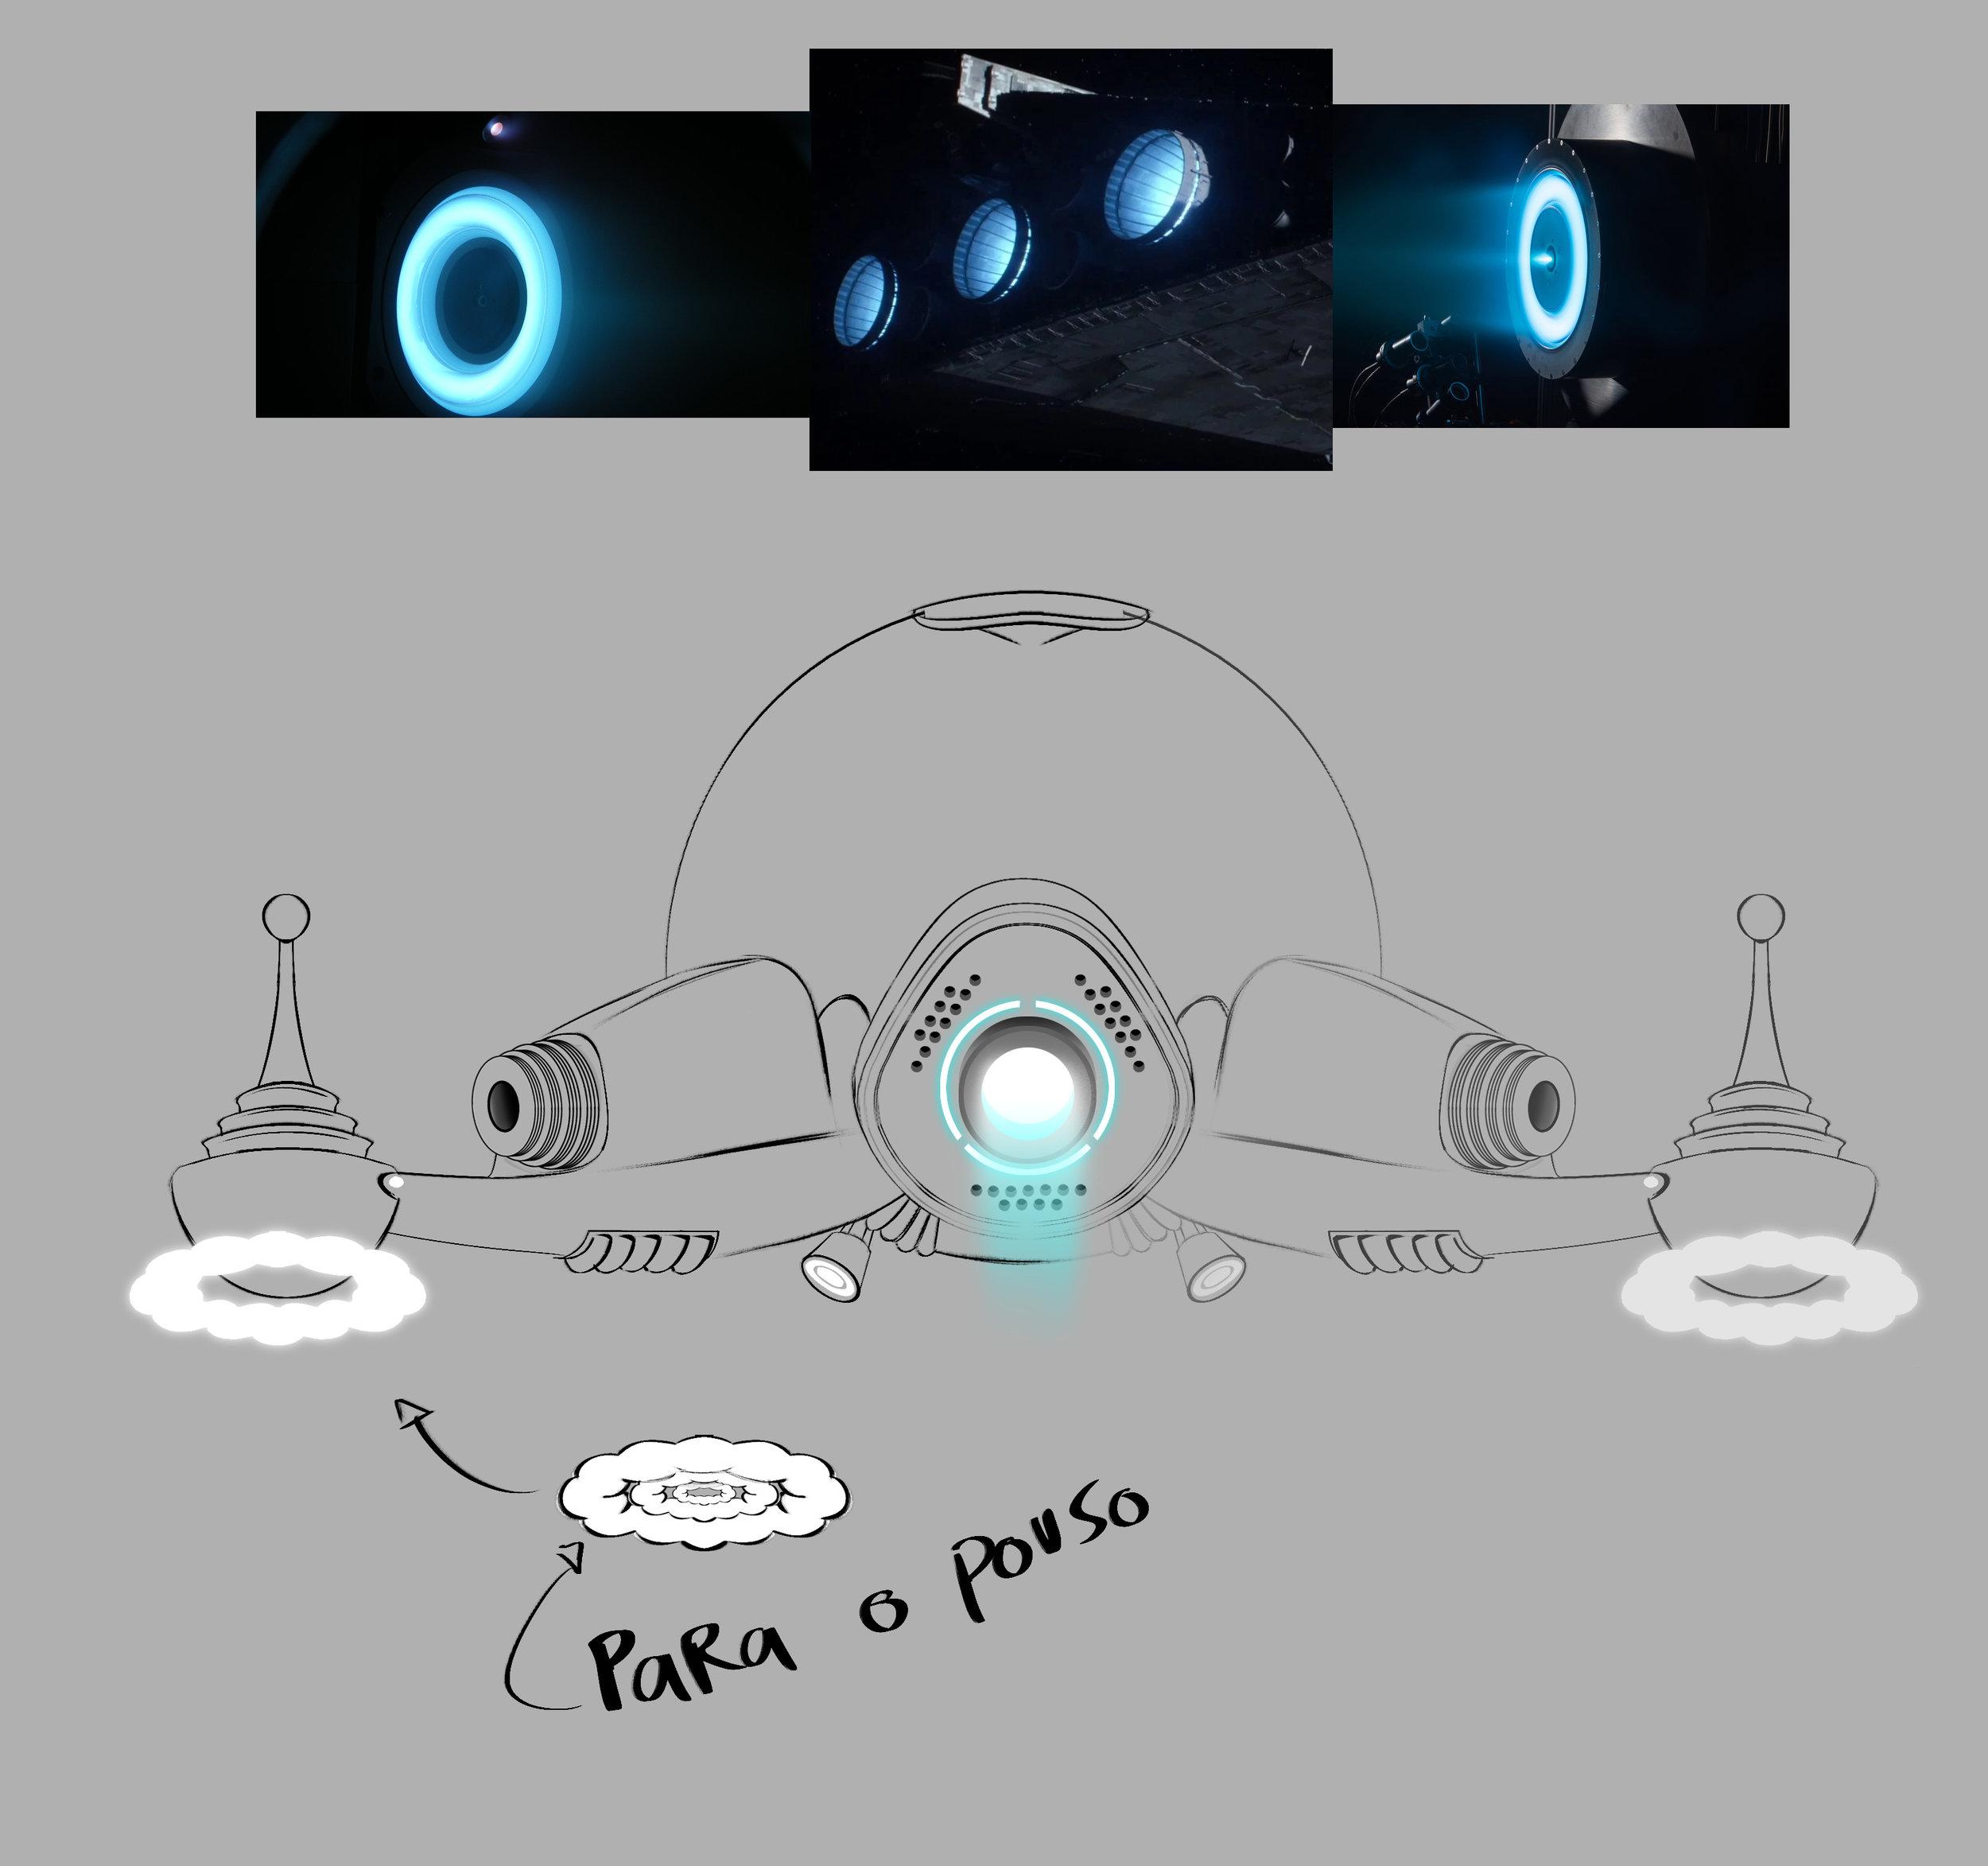 space ship details.jpg